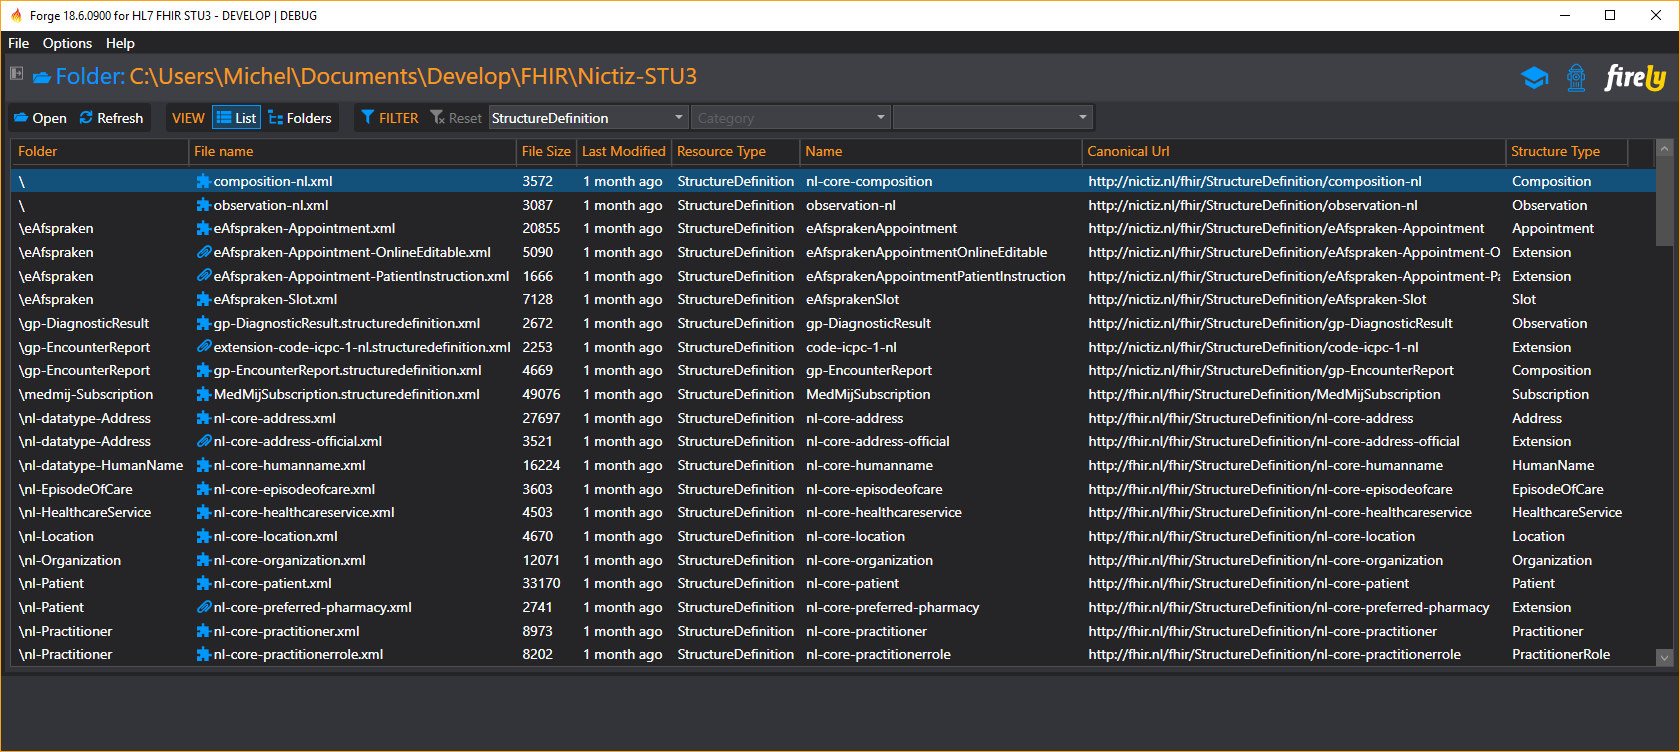 Forge - Folder Explorer (BETA)